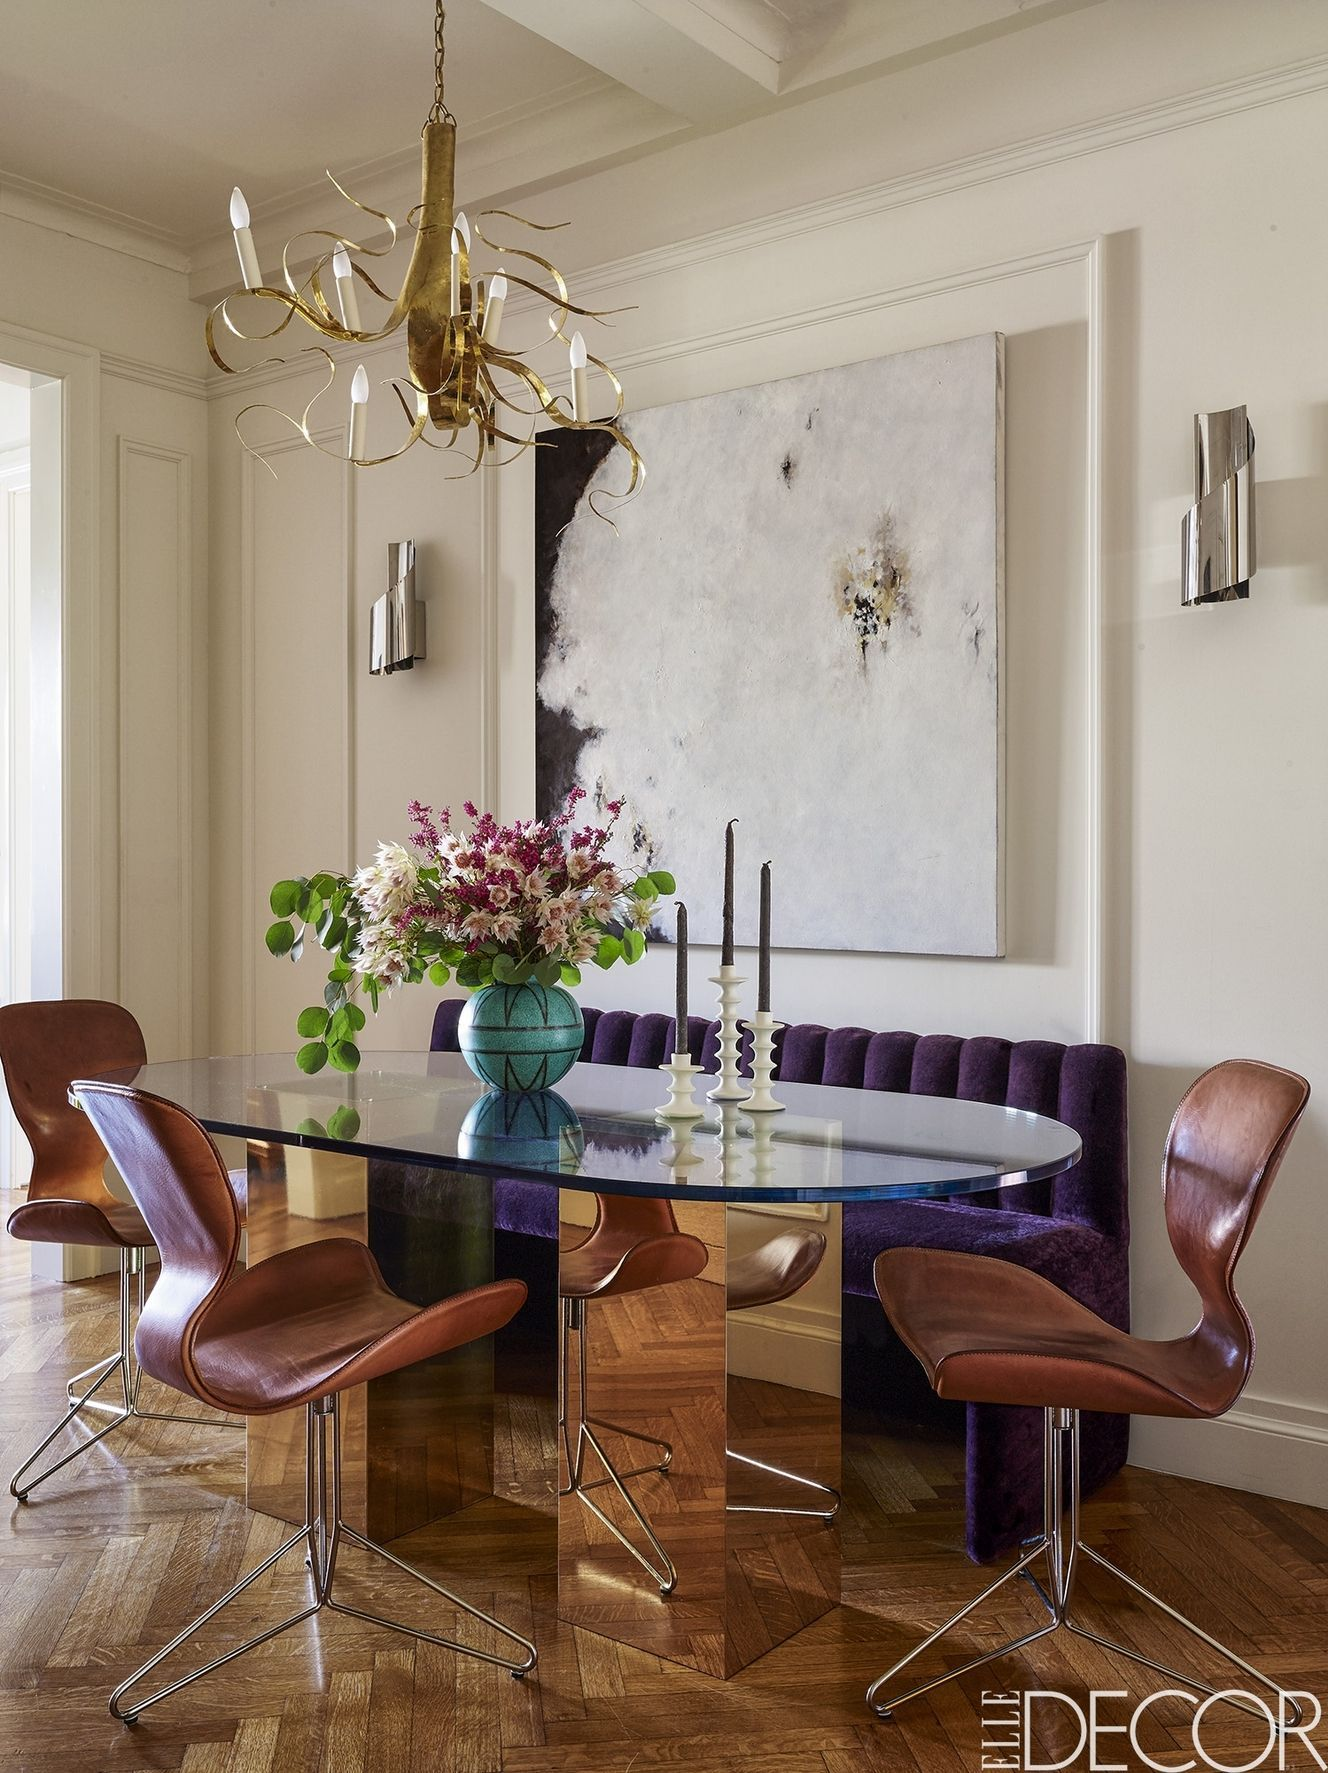 20 Brilliant Dining Room Light Fixture Ideas That Elevate Entertaining